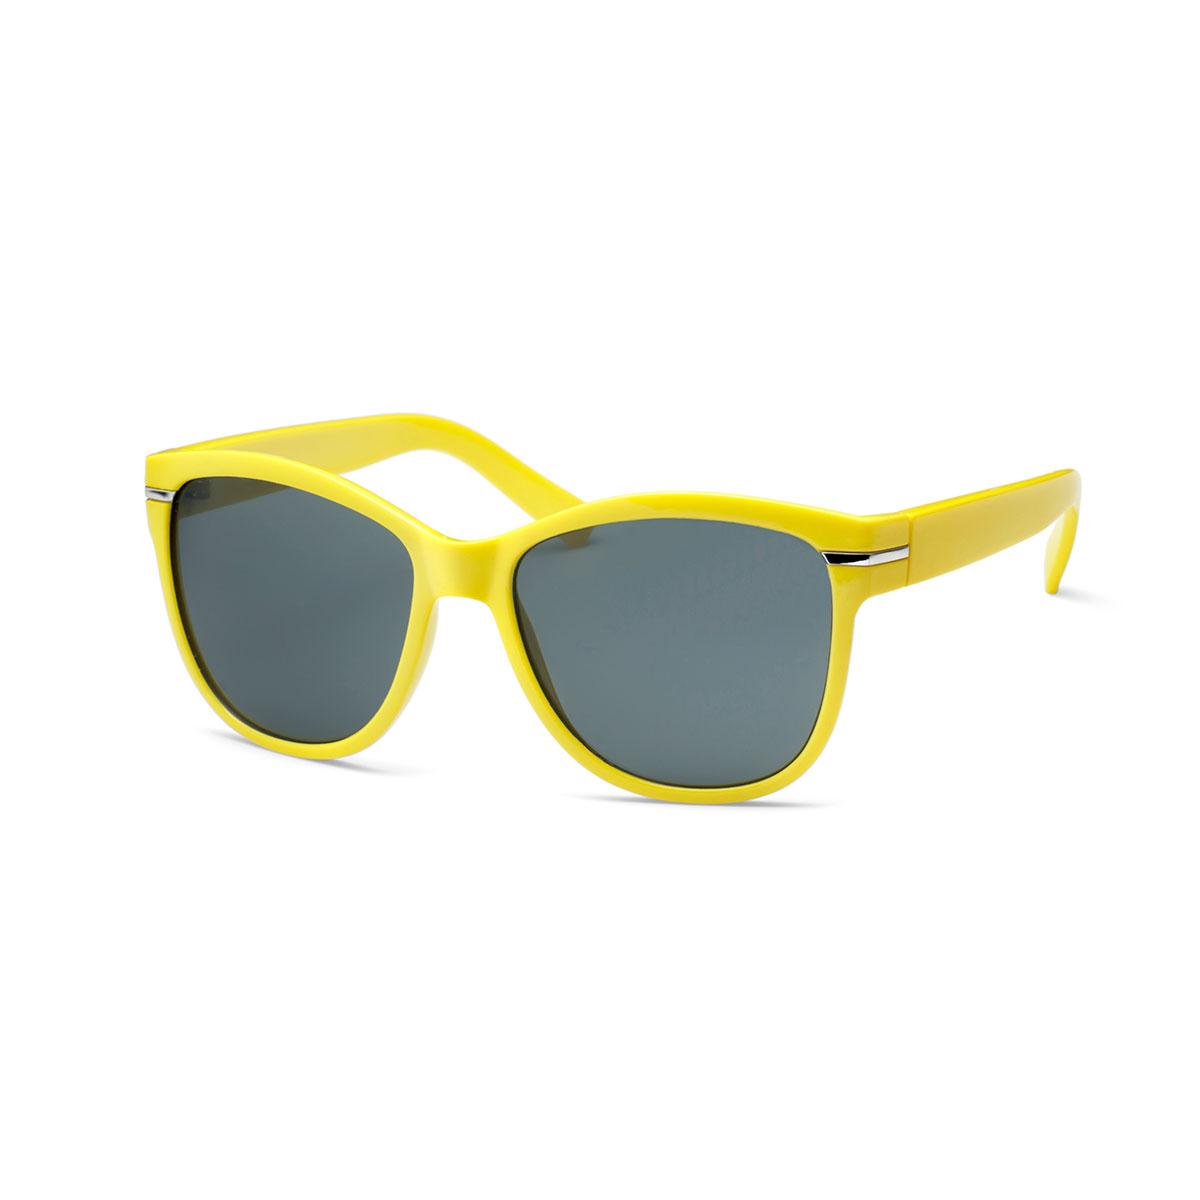 عینک زرد مدل فلوریدا